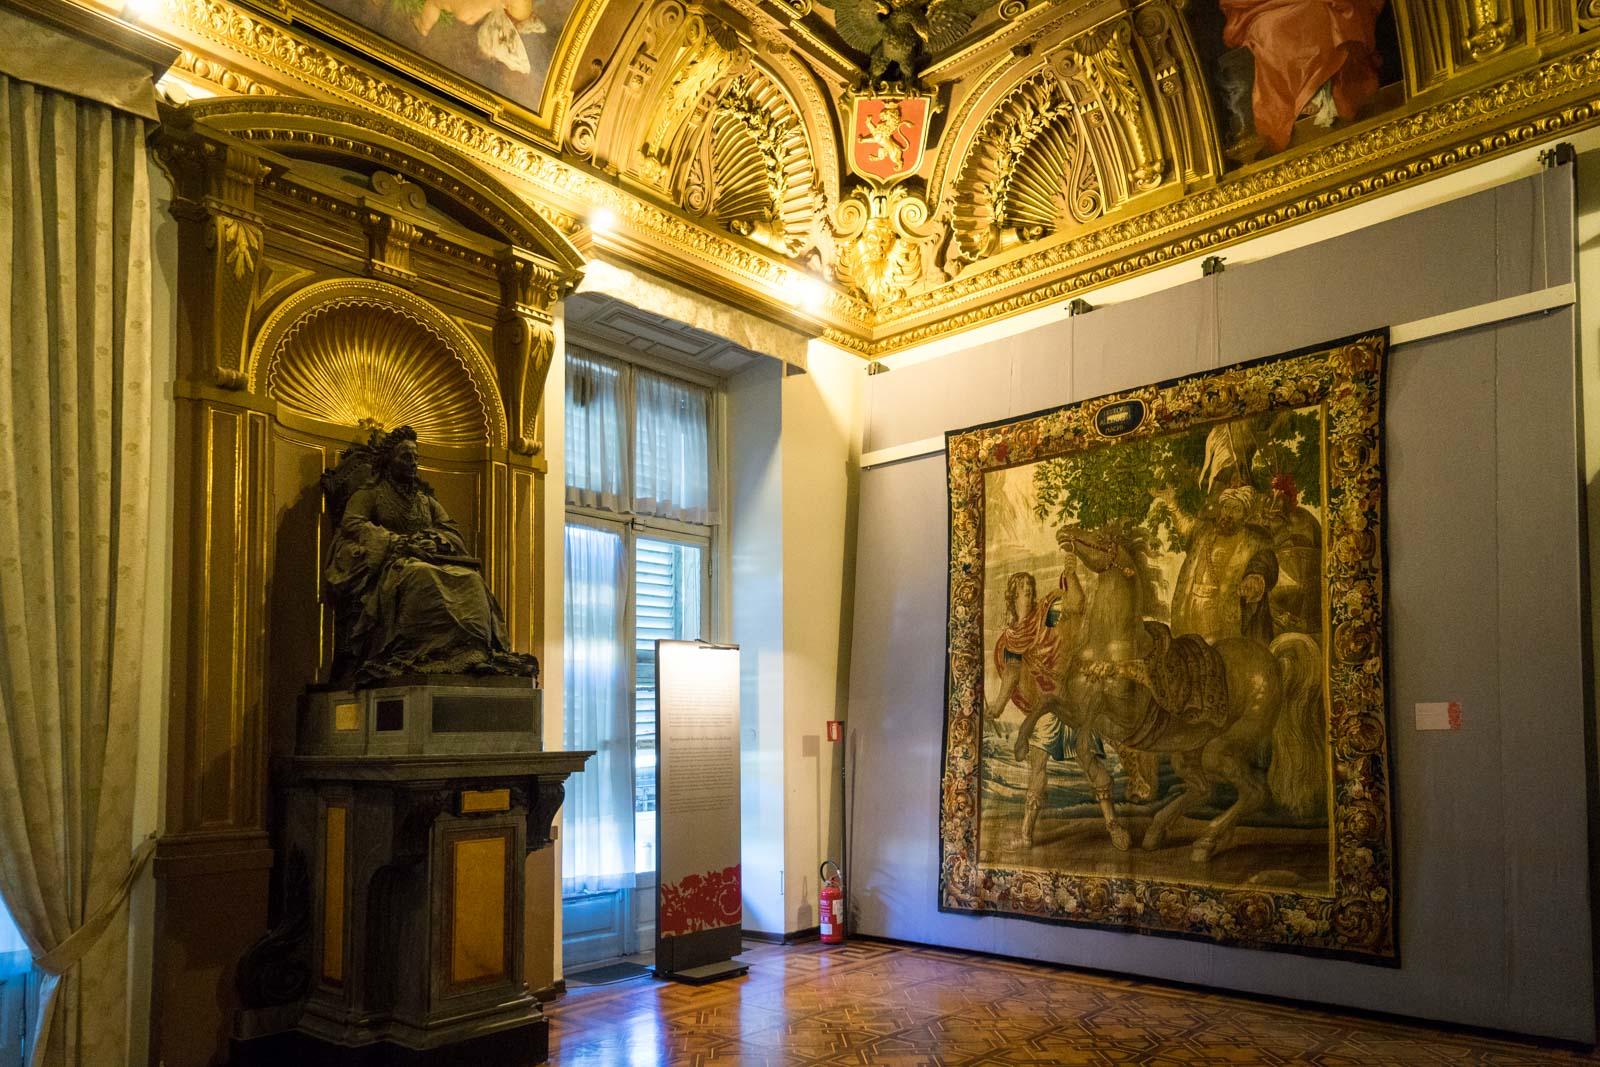 Palazzo Doria Tursi, Genoa, Italy